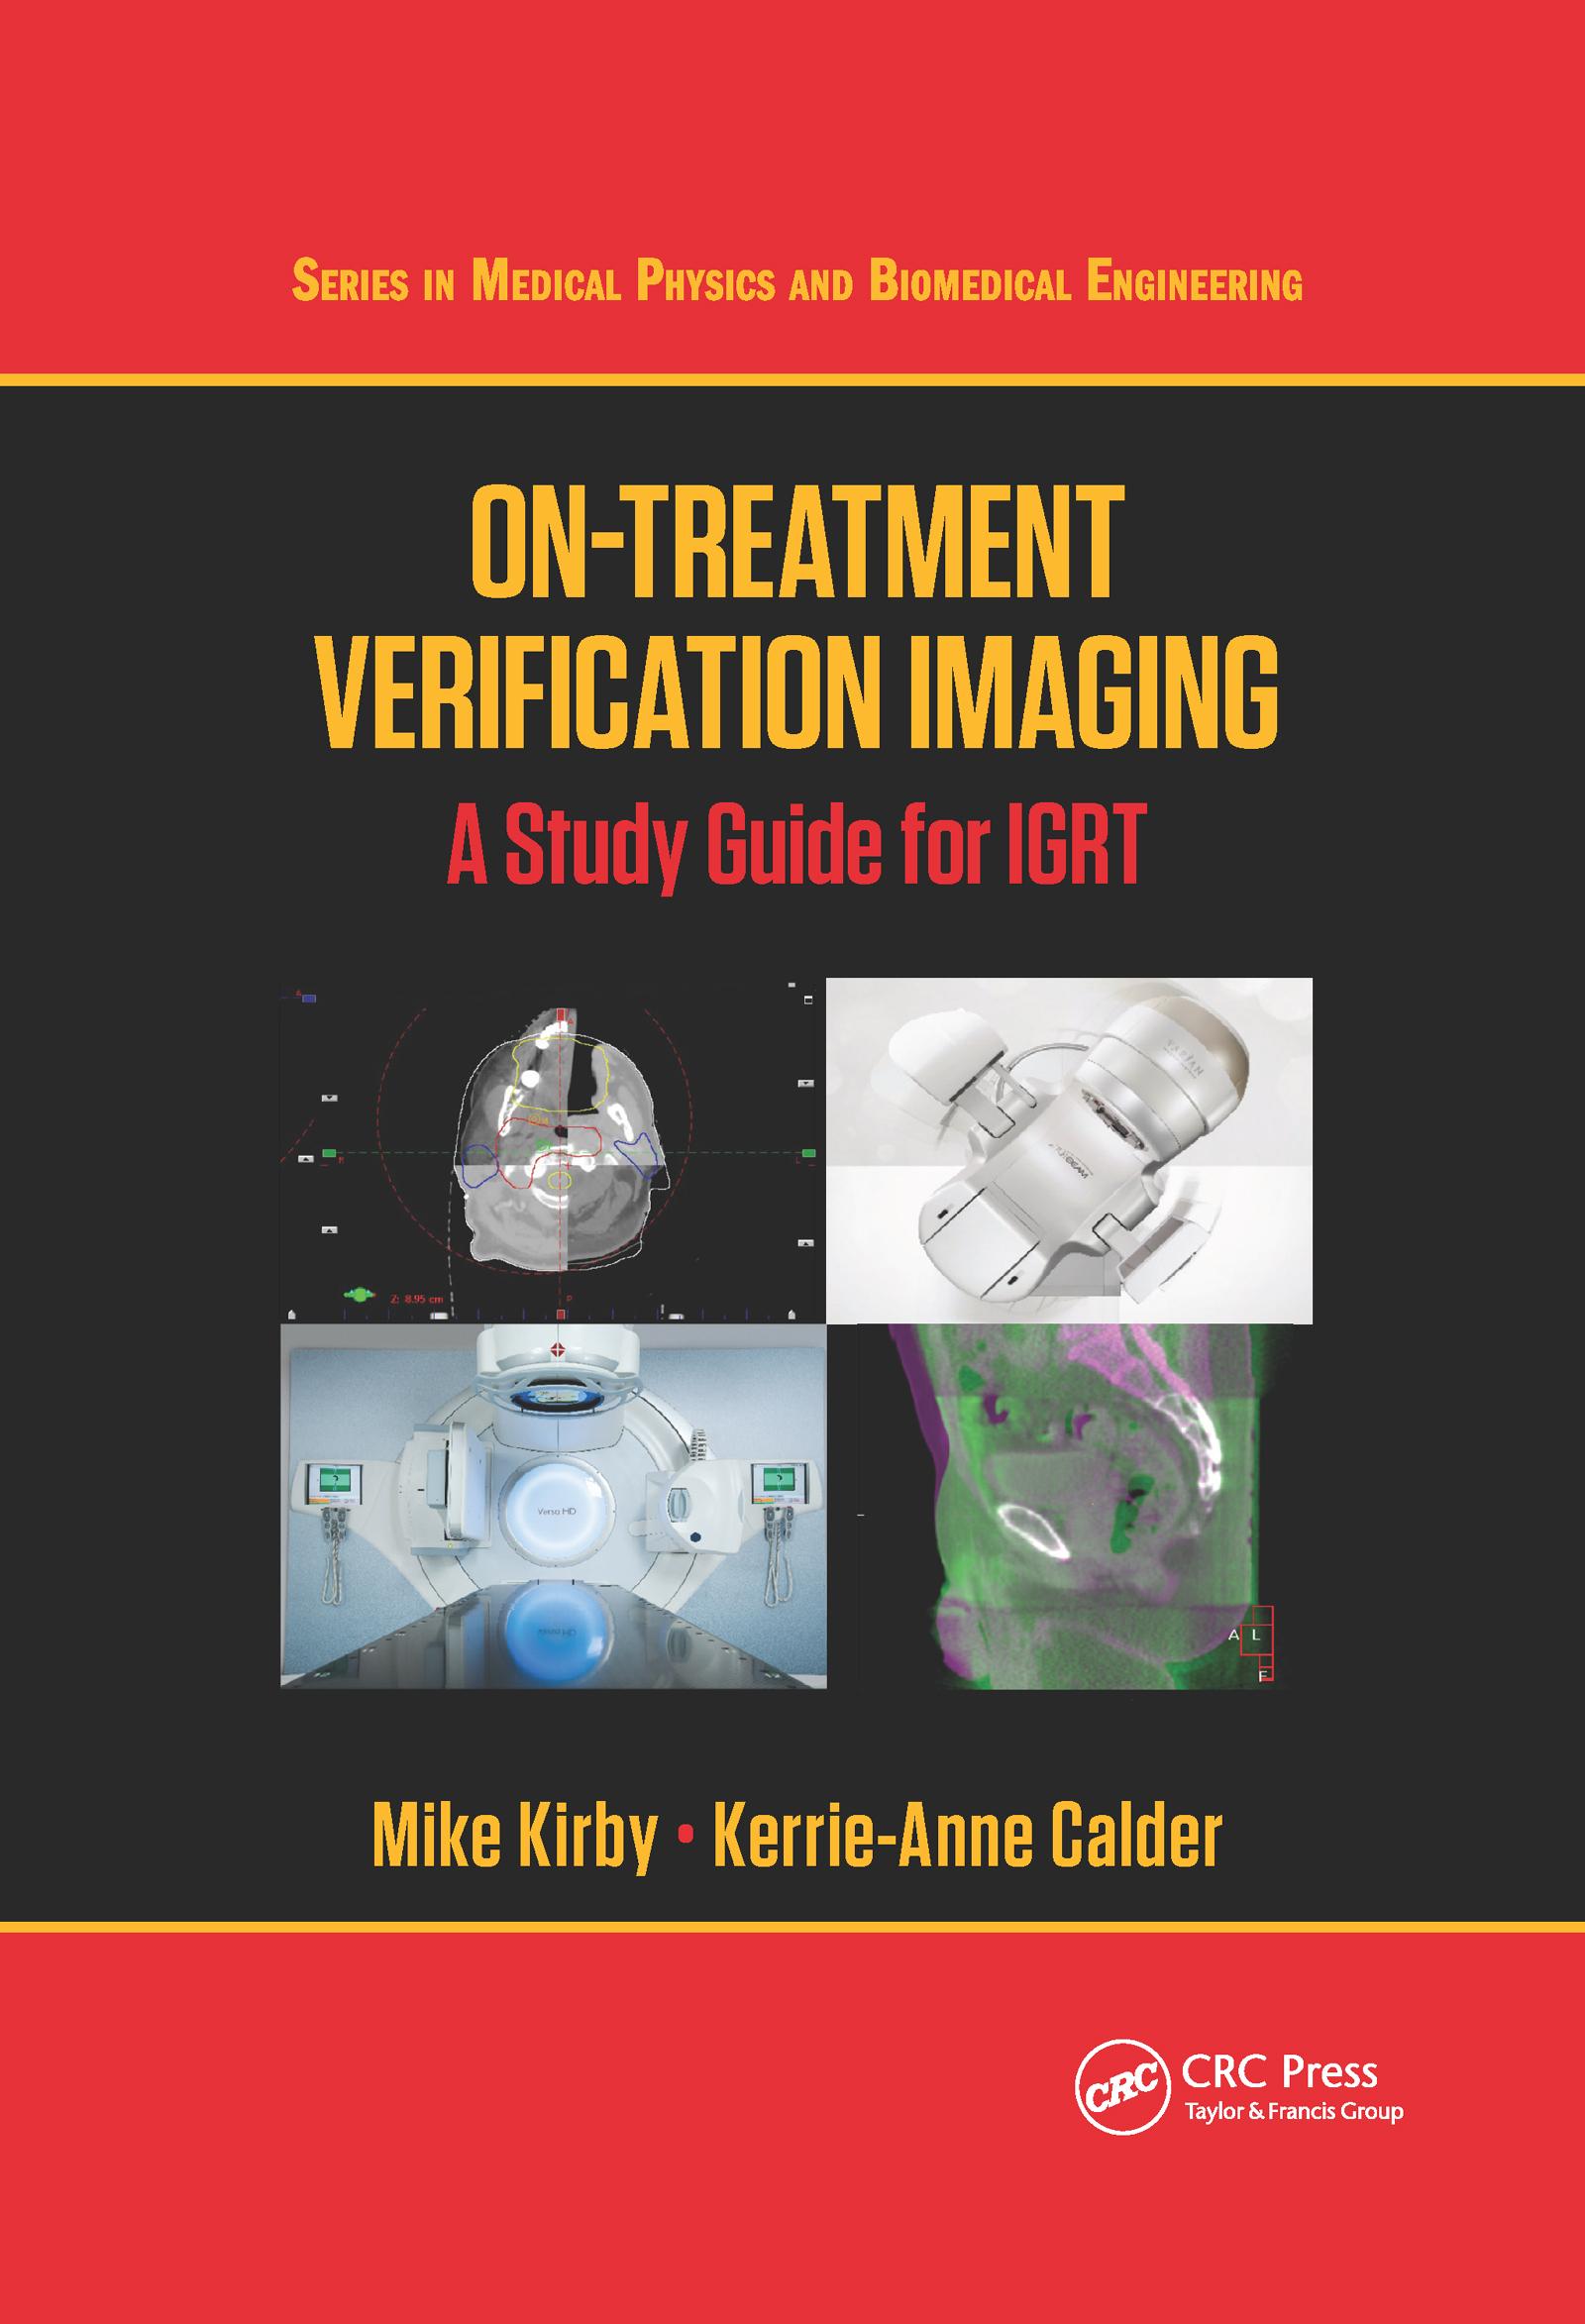 On-Treatment Verification Imaging